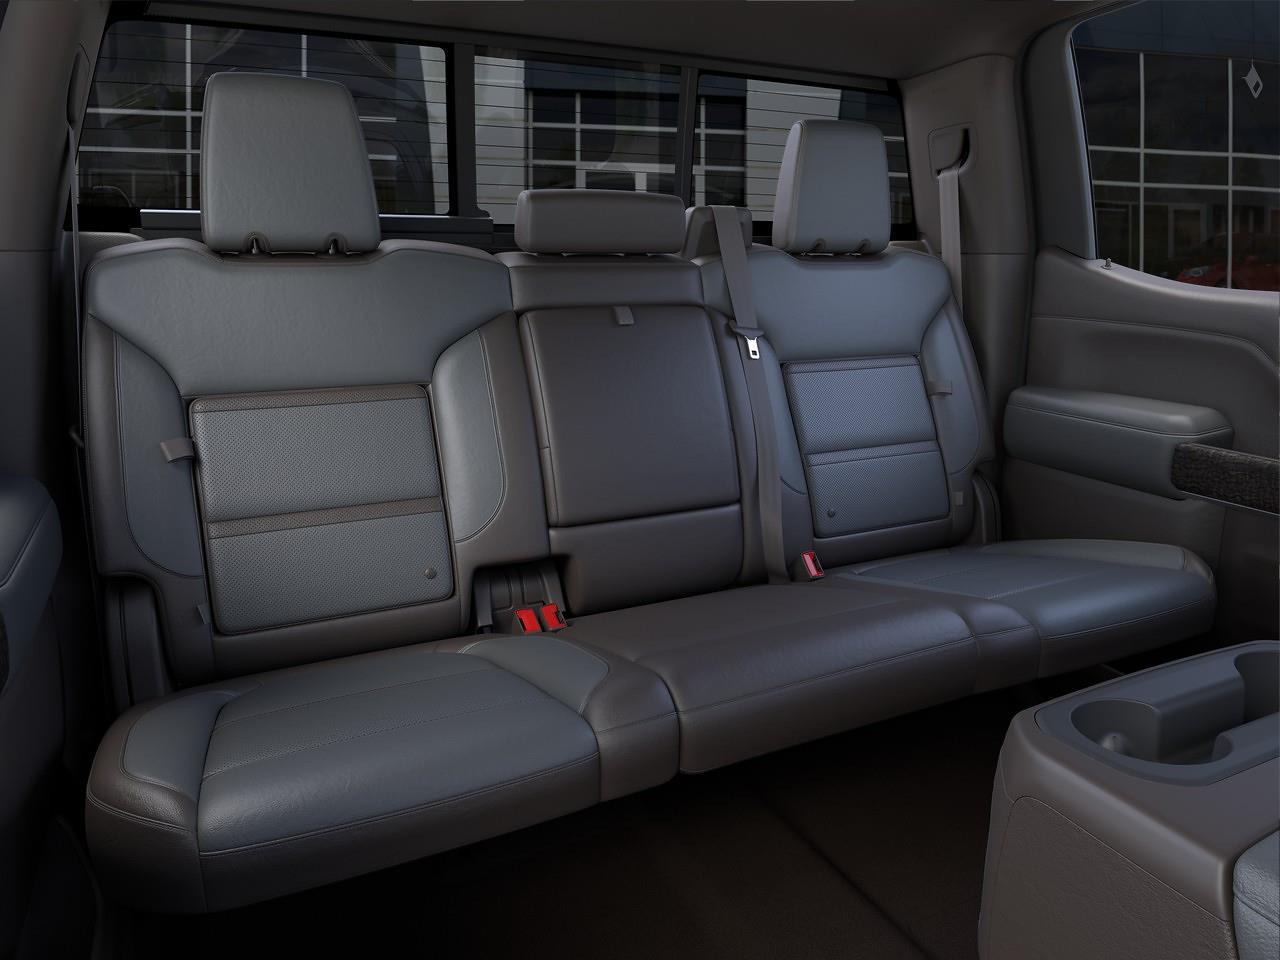 2021 GMC Sierra 1500 Crew Cab 4x4, Pickup #217054 - photo 14